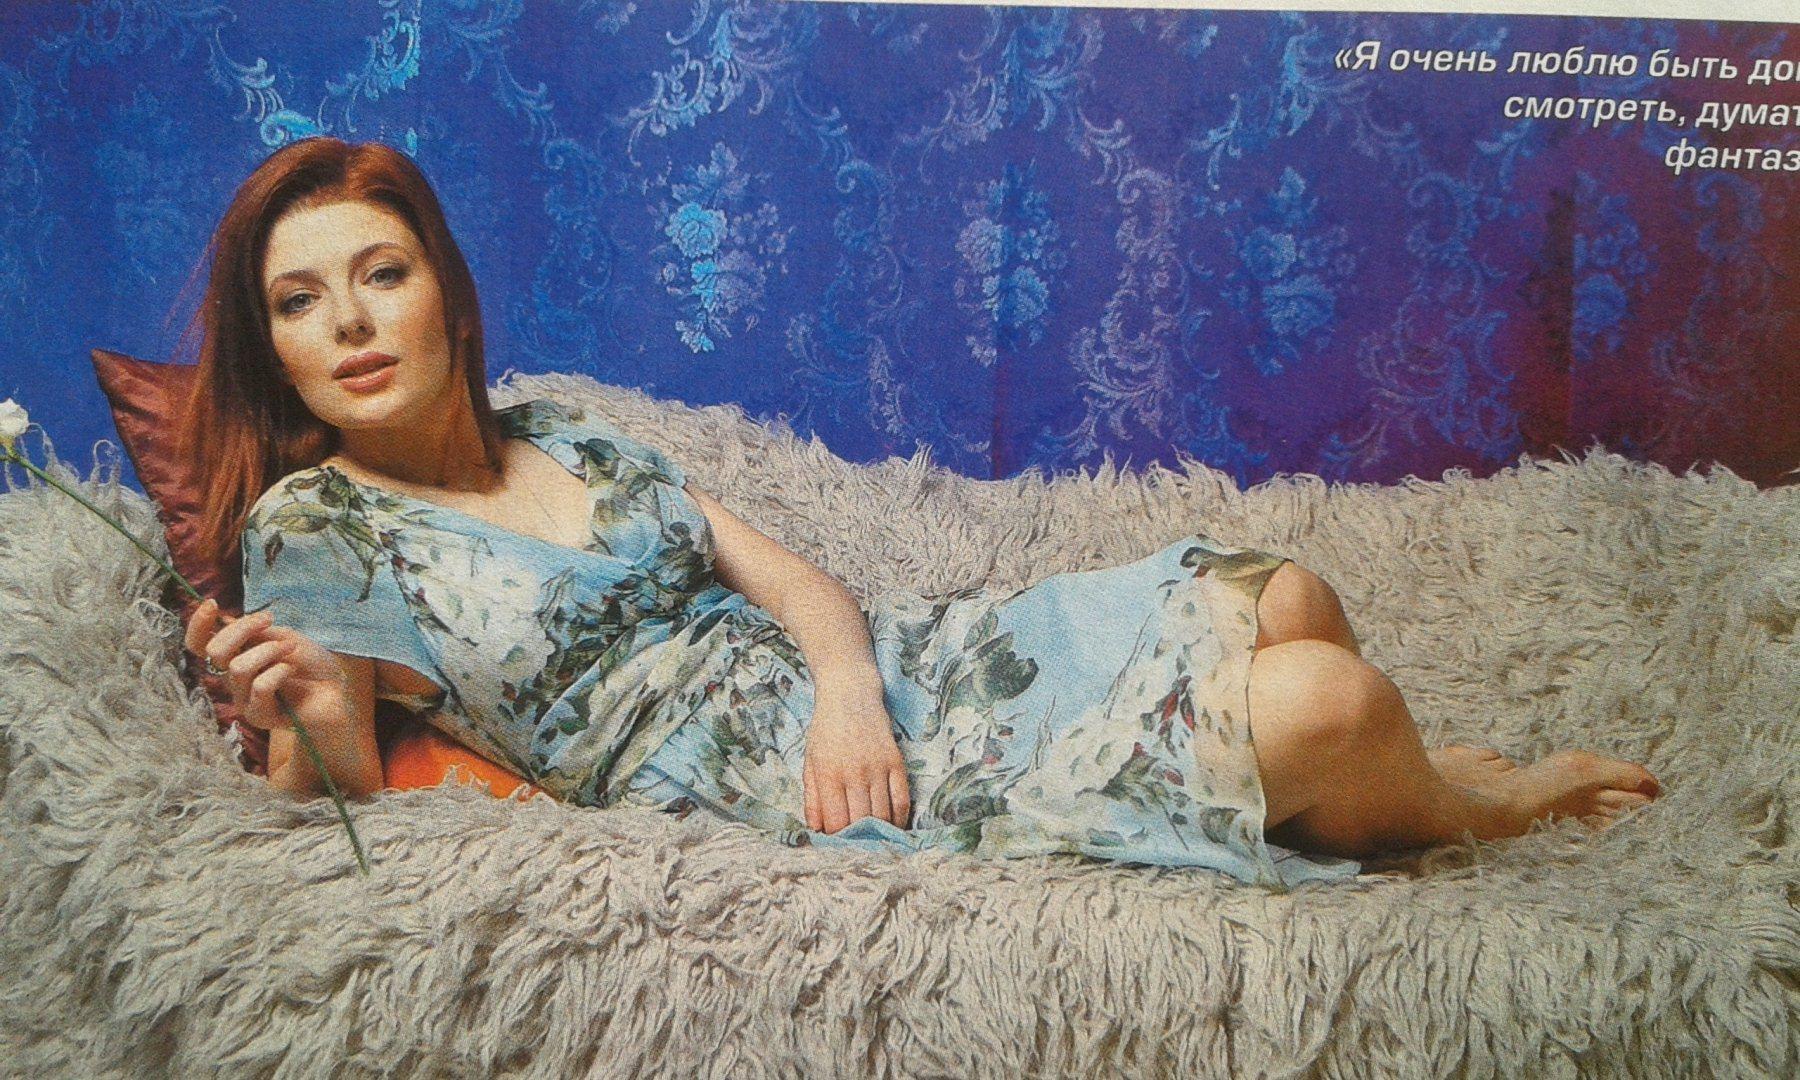 Актриса эмилия спивак личная жизнь муж дети фото